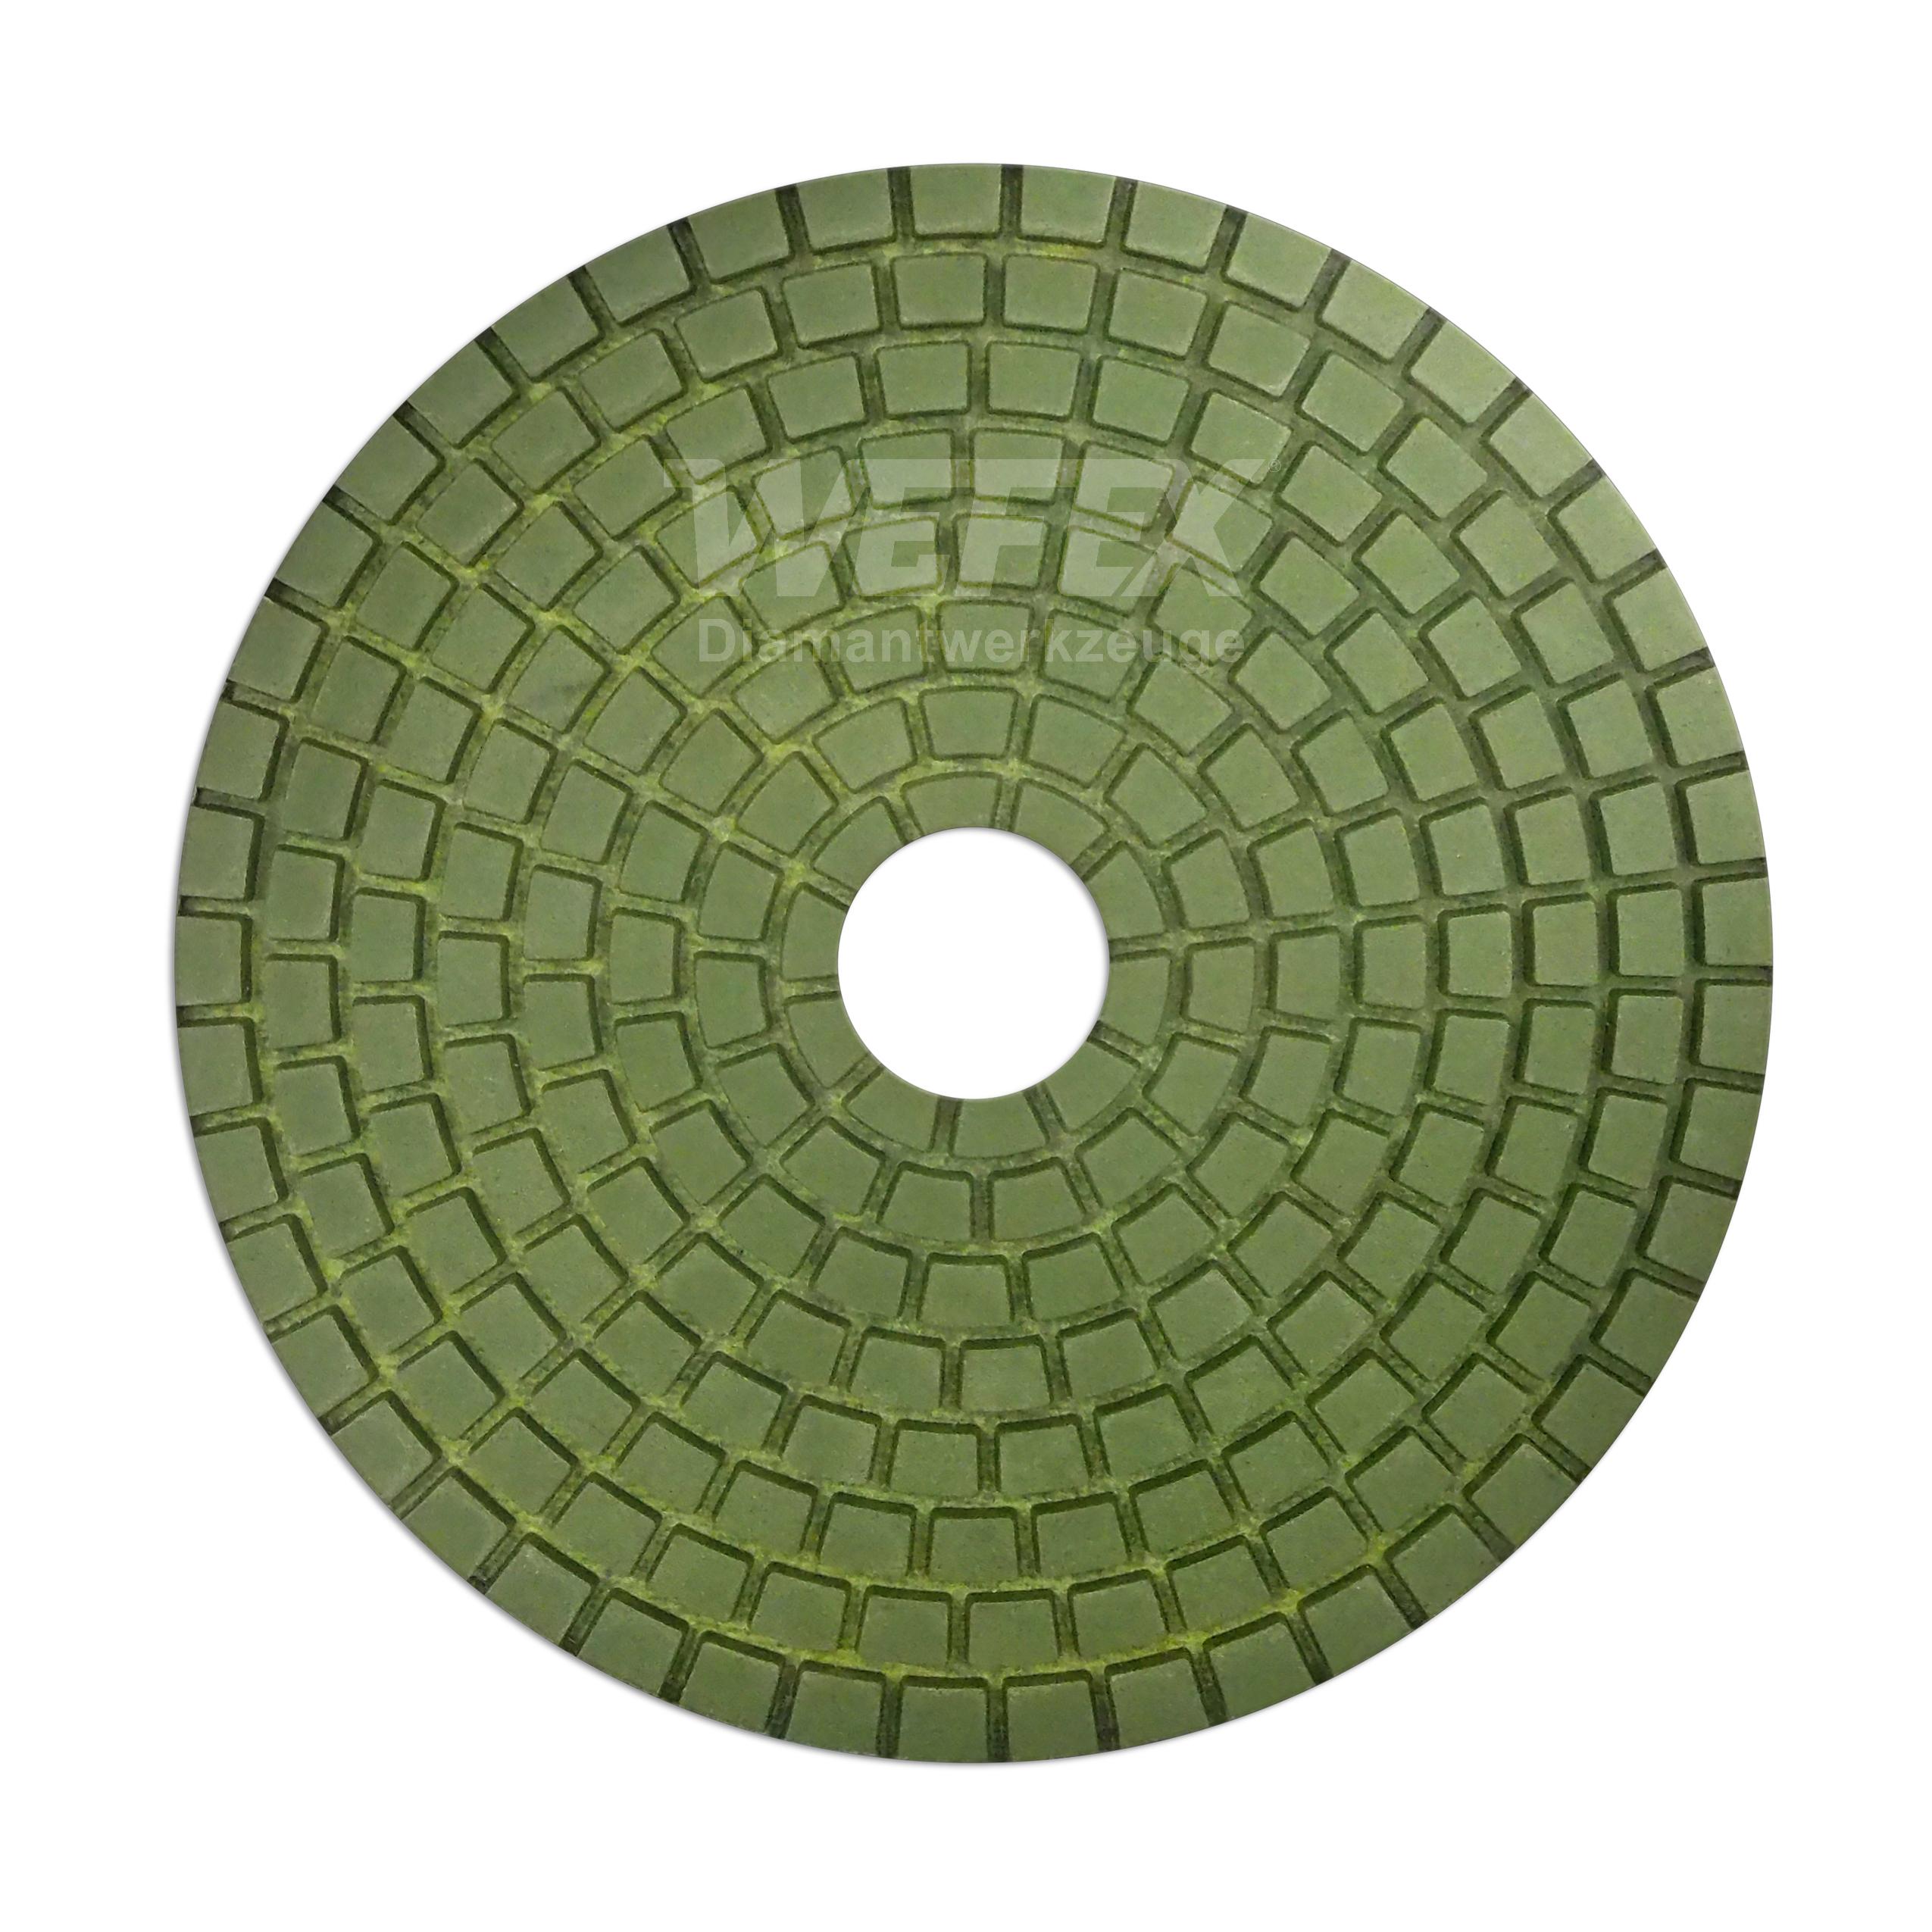 Diamant Schleifpad Naß 100 mm Granit Naturstein Marmor finishen Polierpad